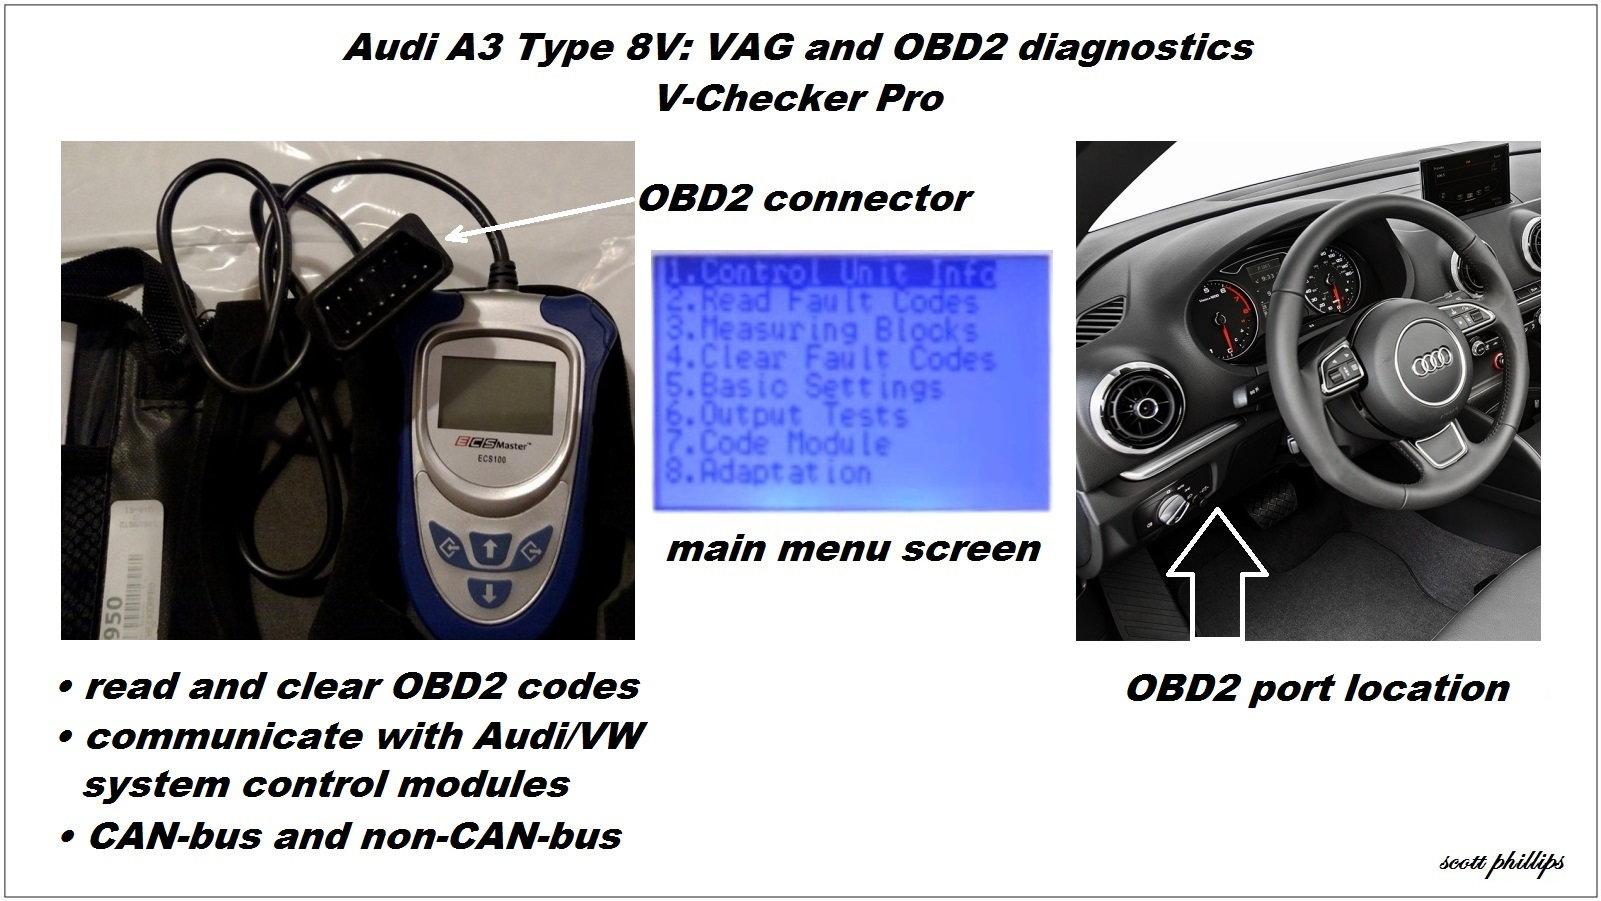 audi a3 tips and tricks audiworld rh audiworld com Audi A3 TDI Audi A3 Manual PDF